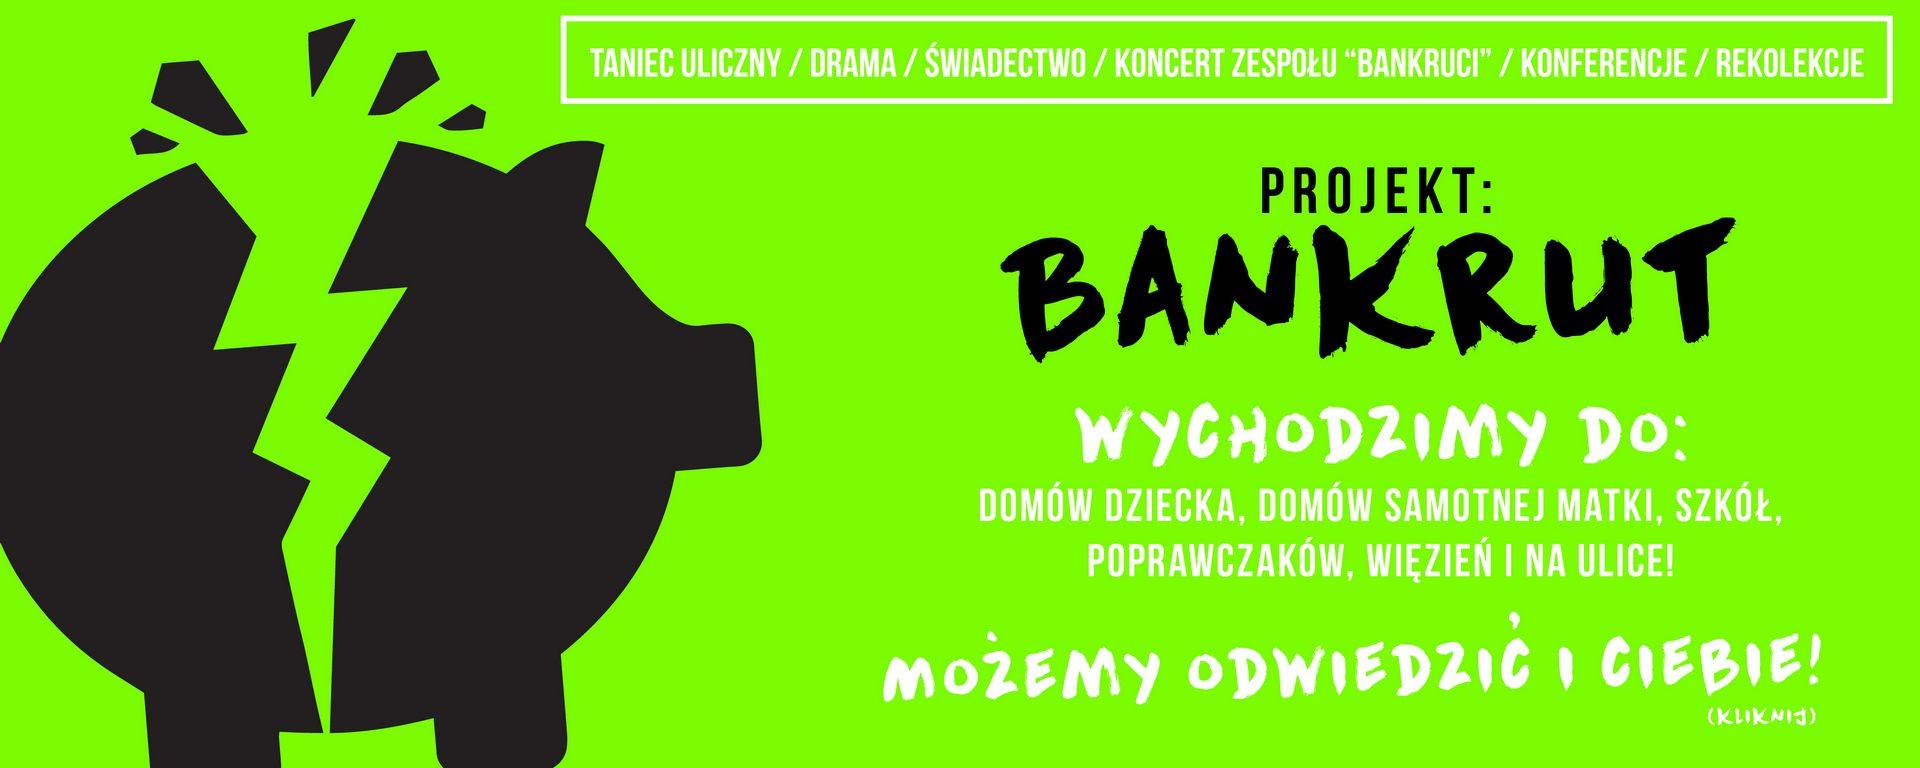 baner_bankrut_web-01m